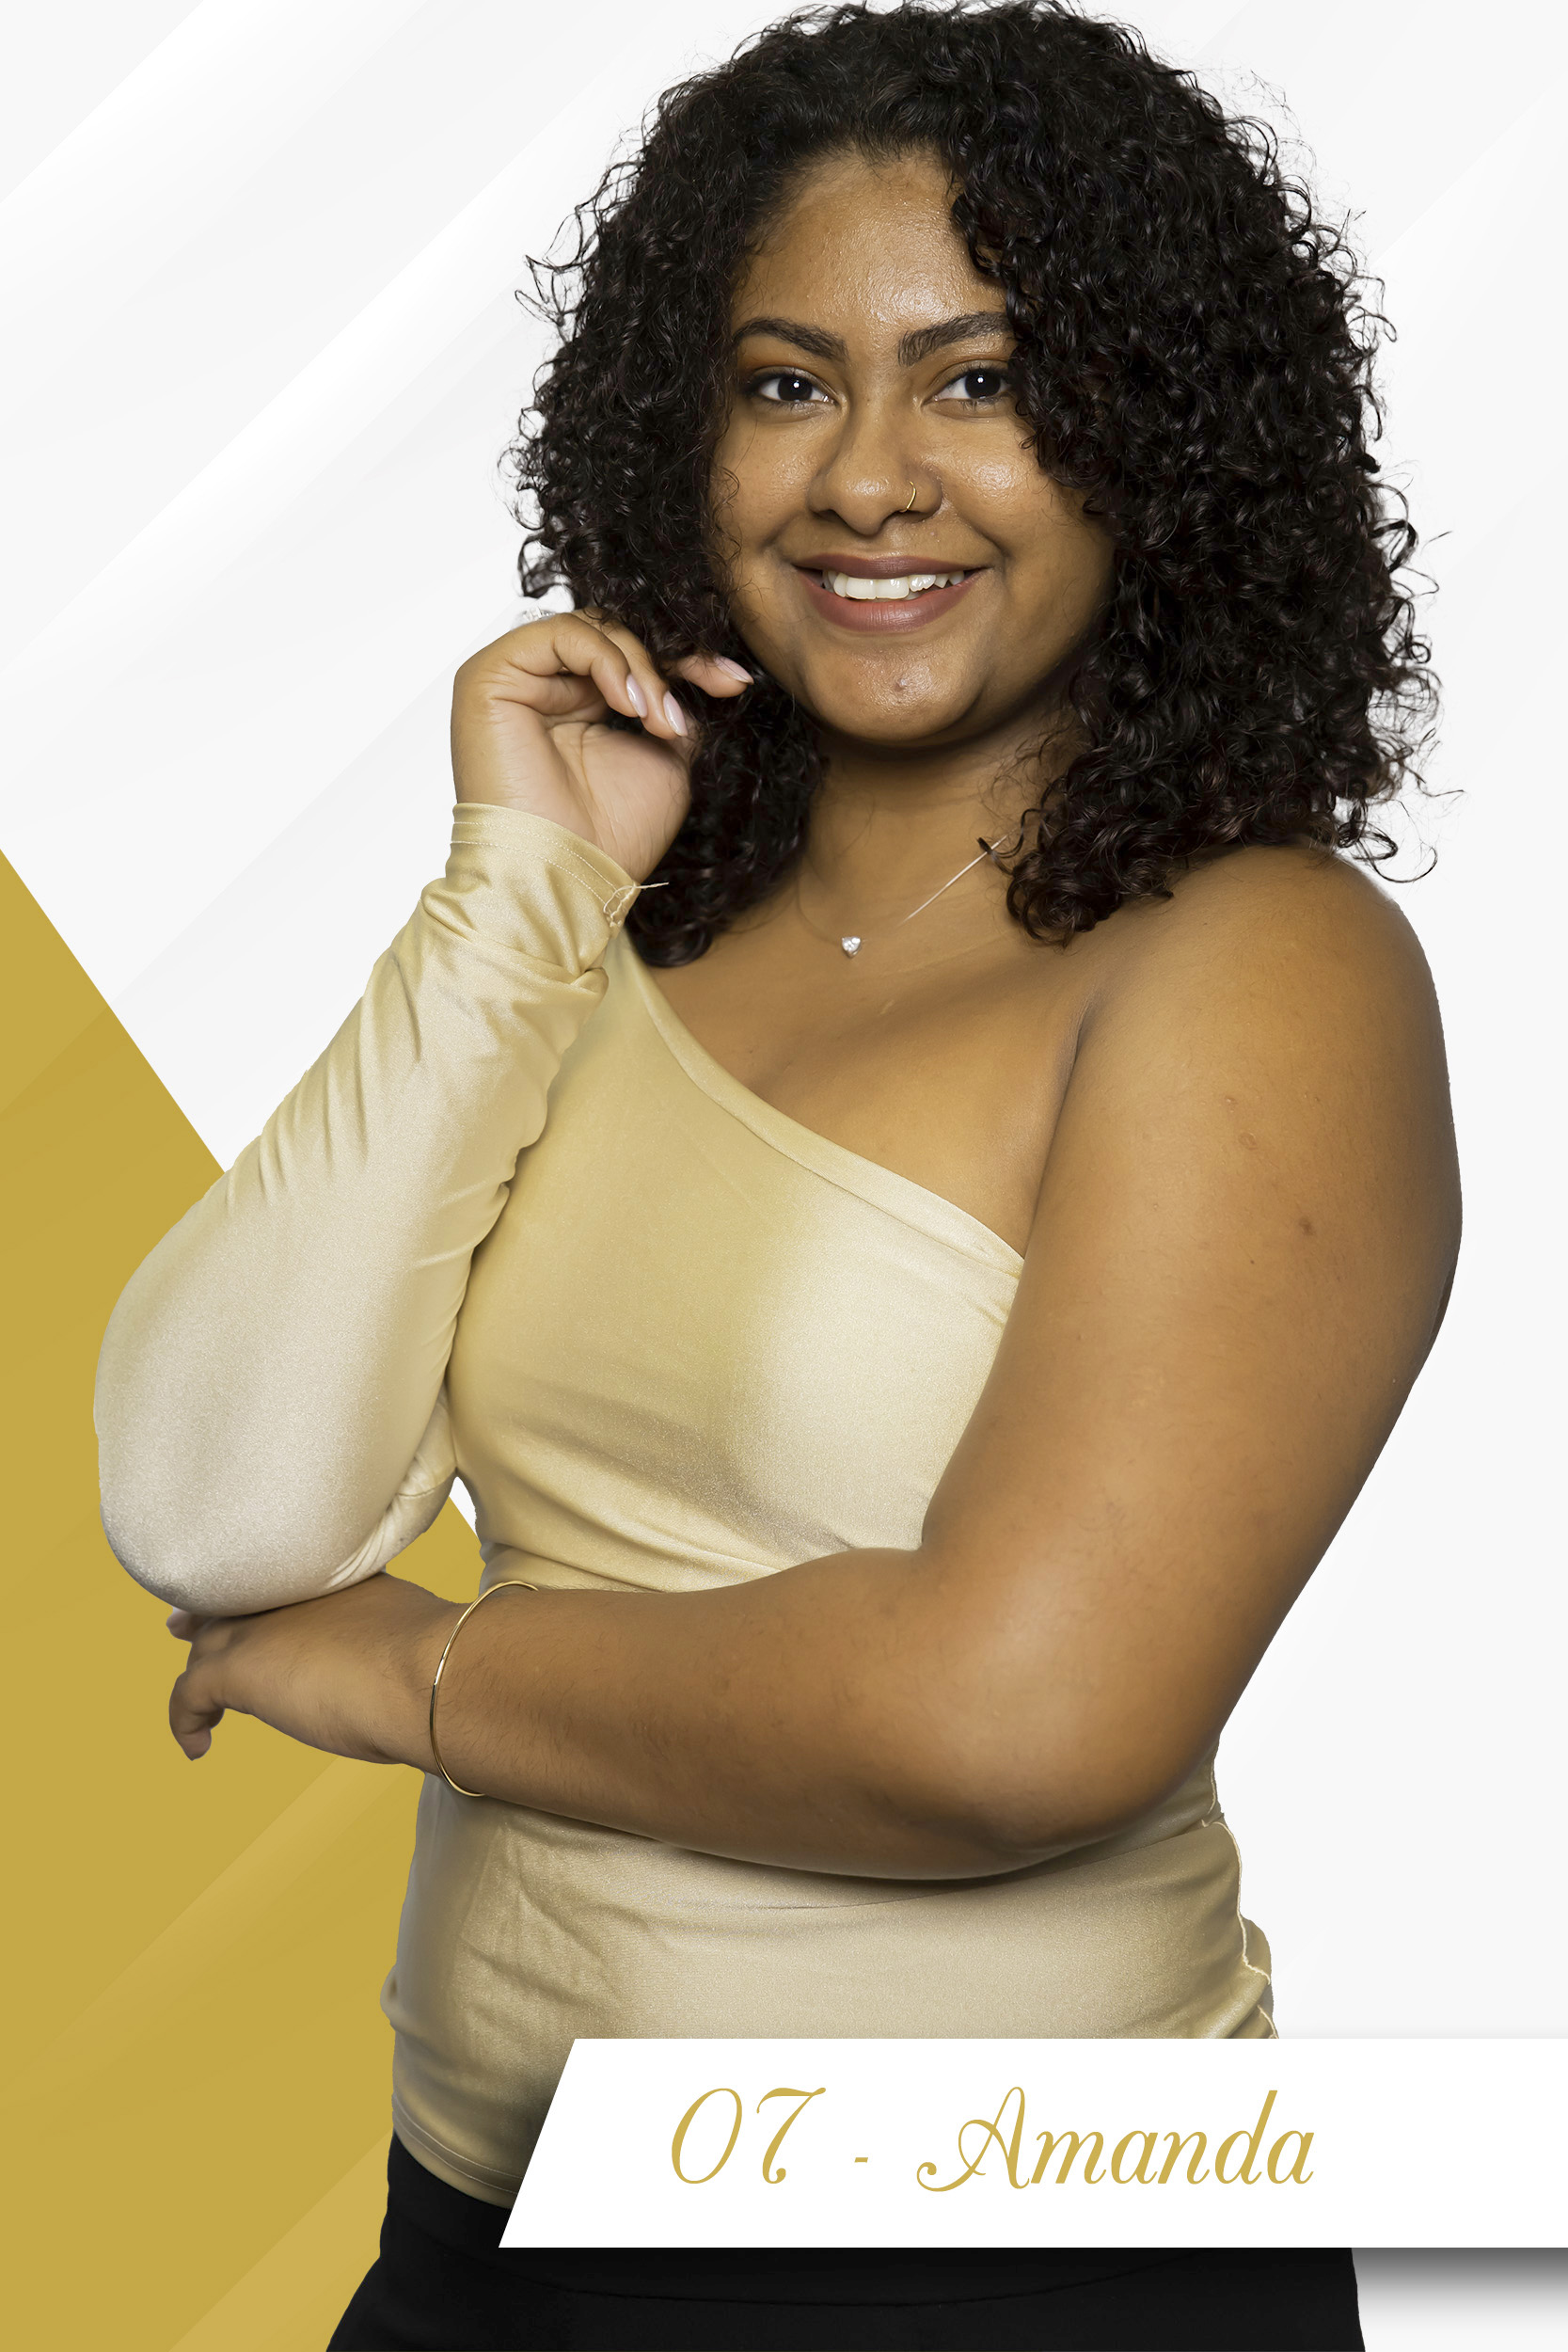 N°7: Amanda Ramdavoua